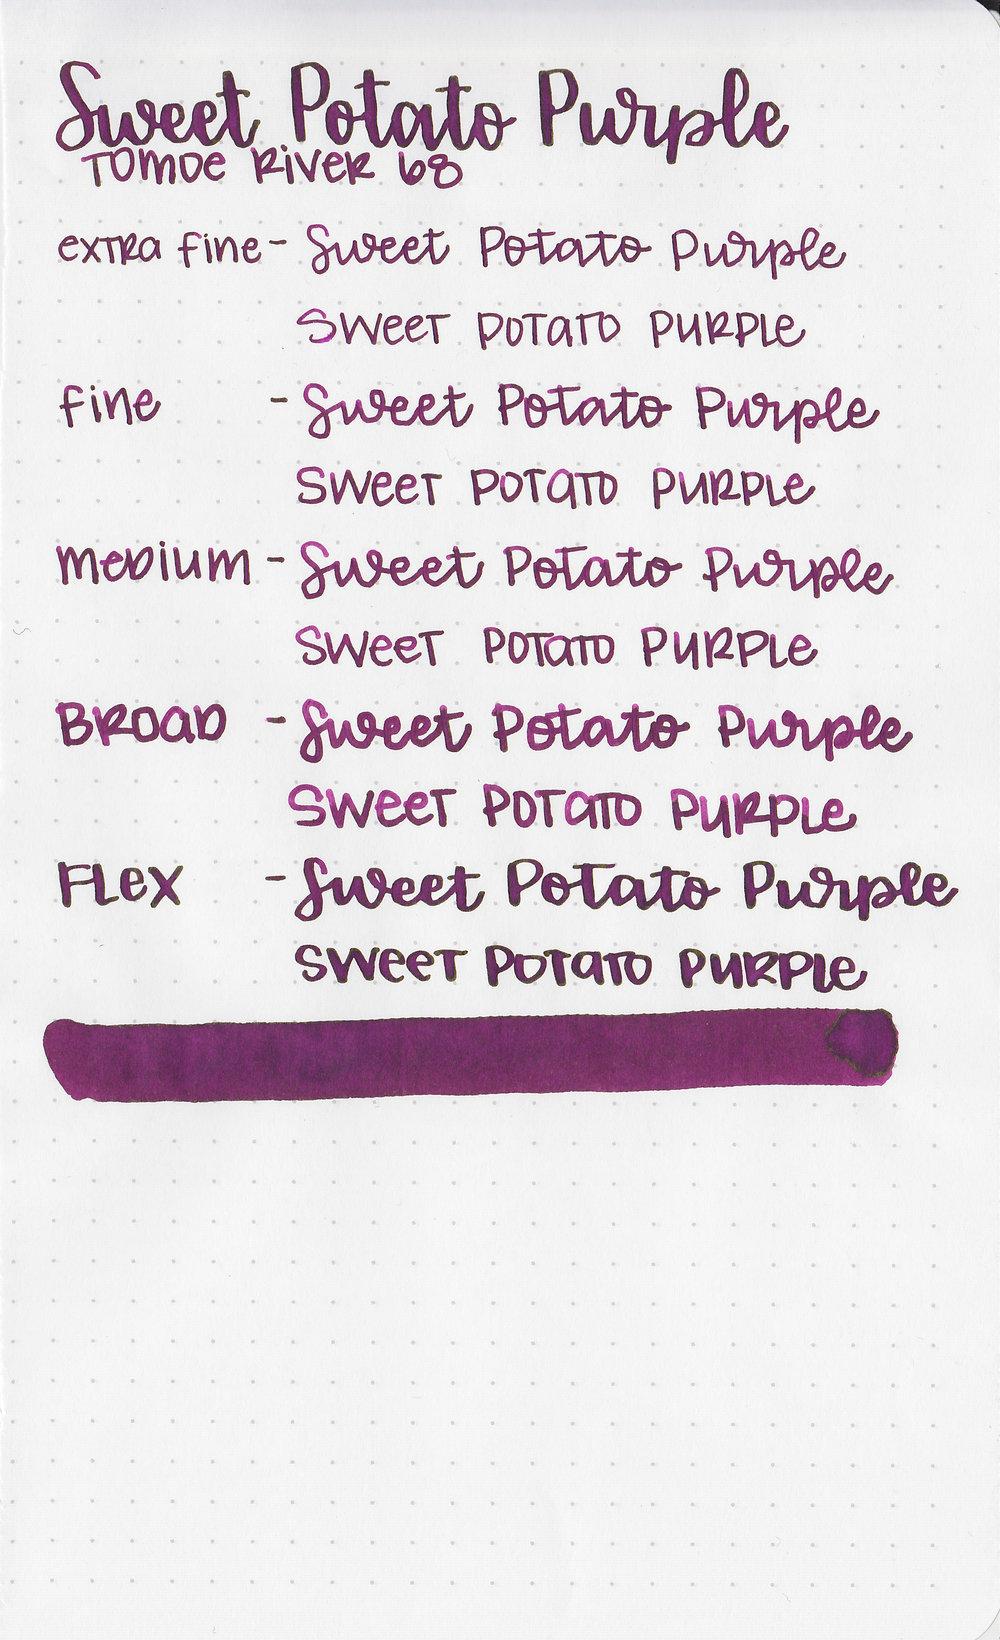 bb-sweet-potato-purple-9.jpg